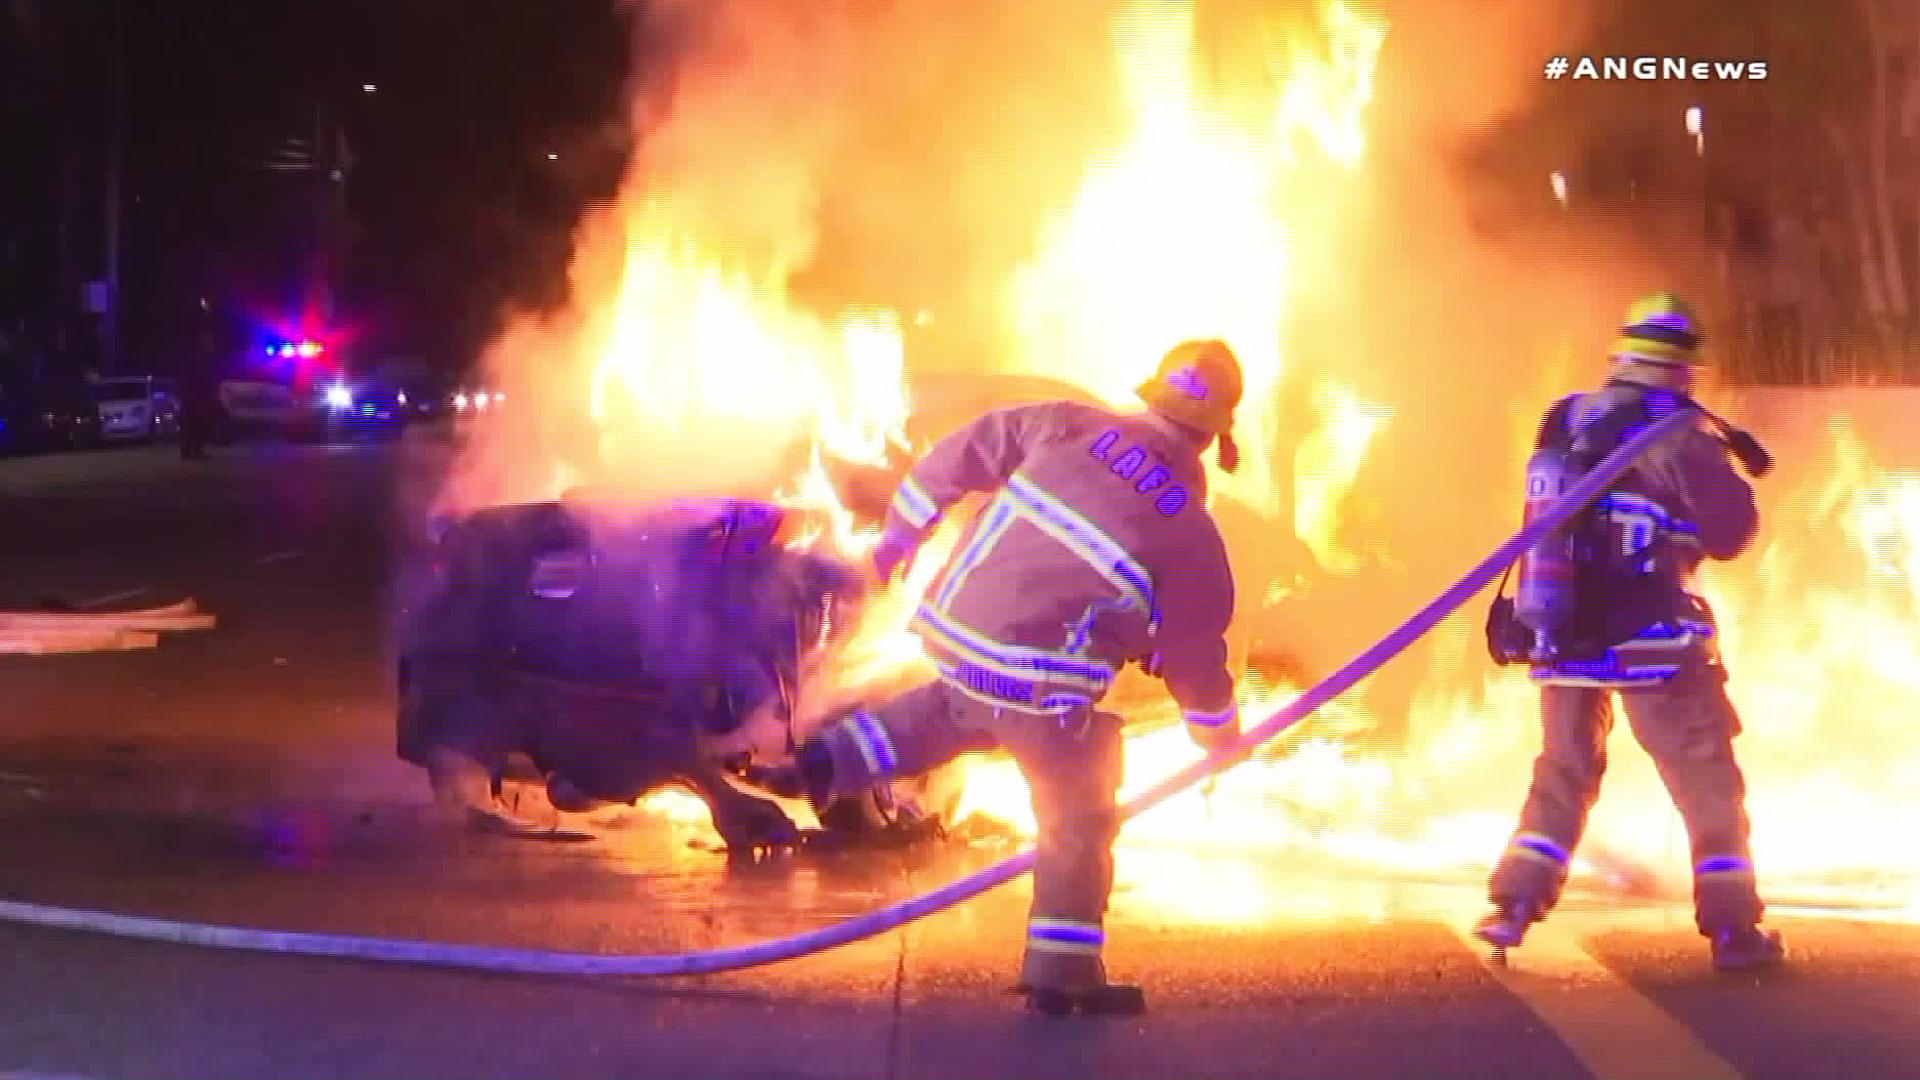 Crews respond to a car fire in Northridge on Nov. 19, 2018. (Credit: ANGNews)